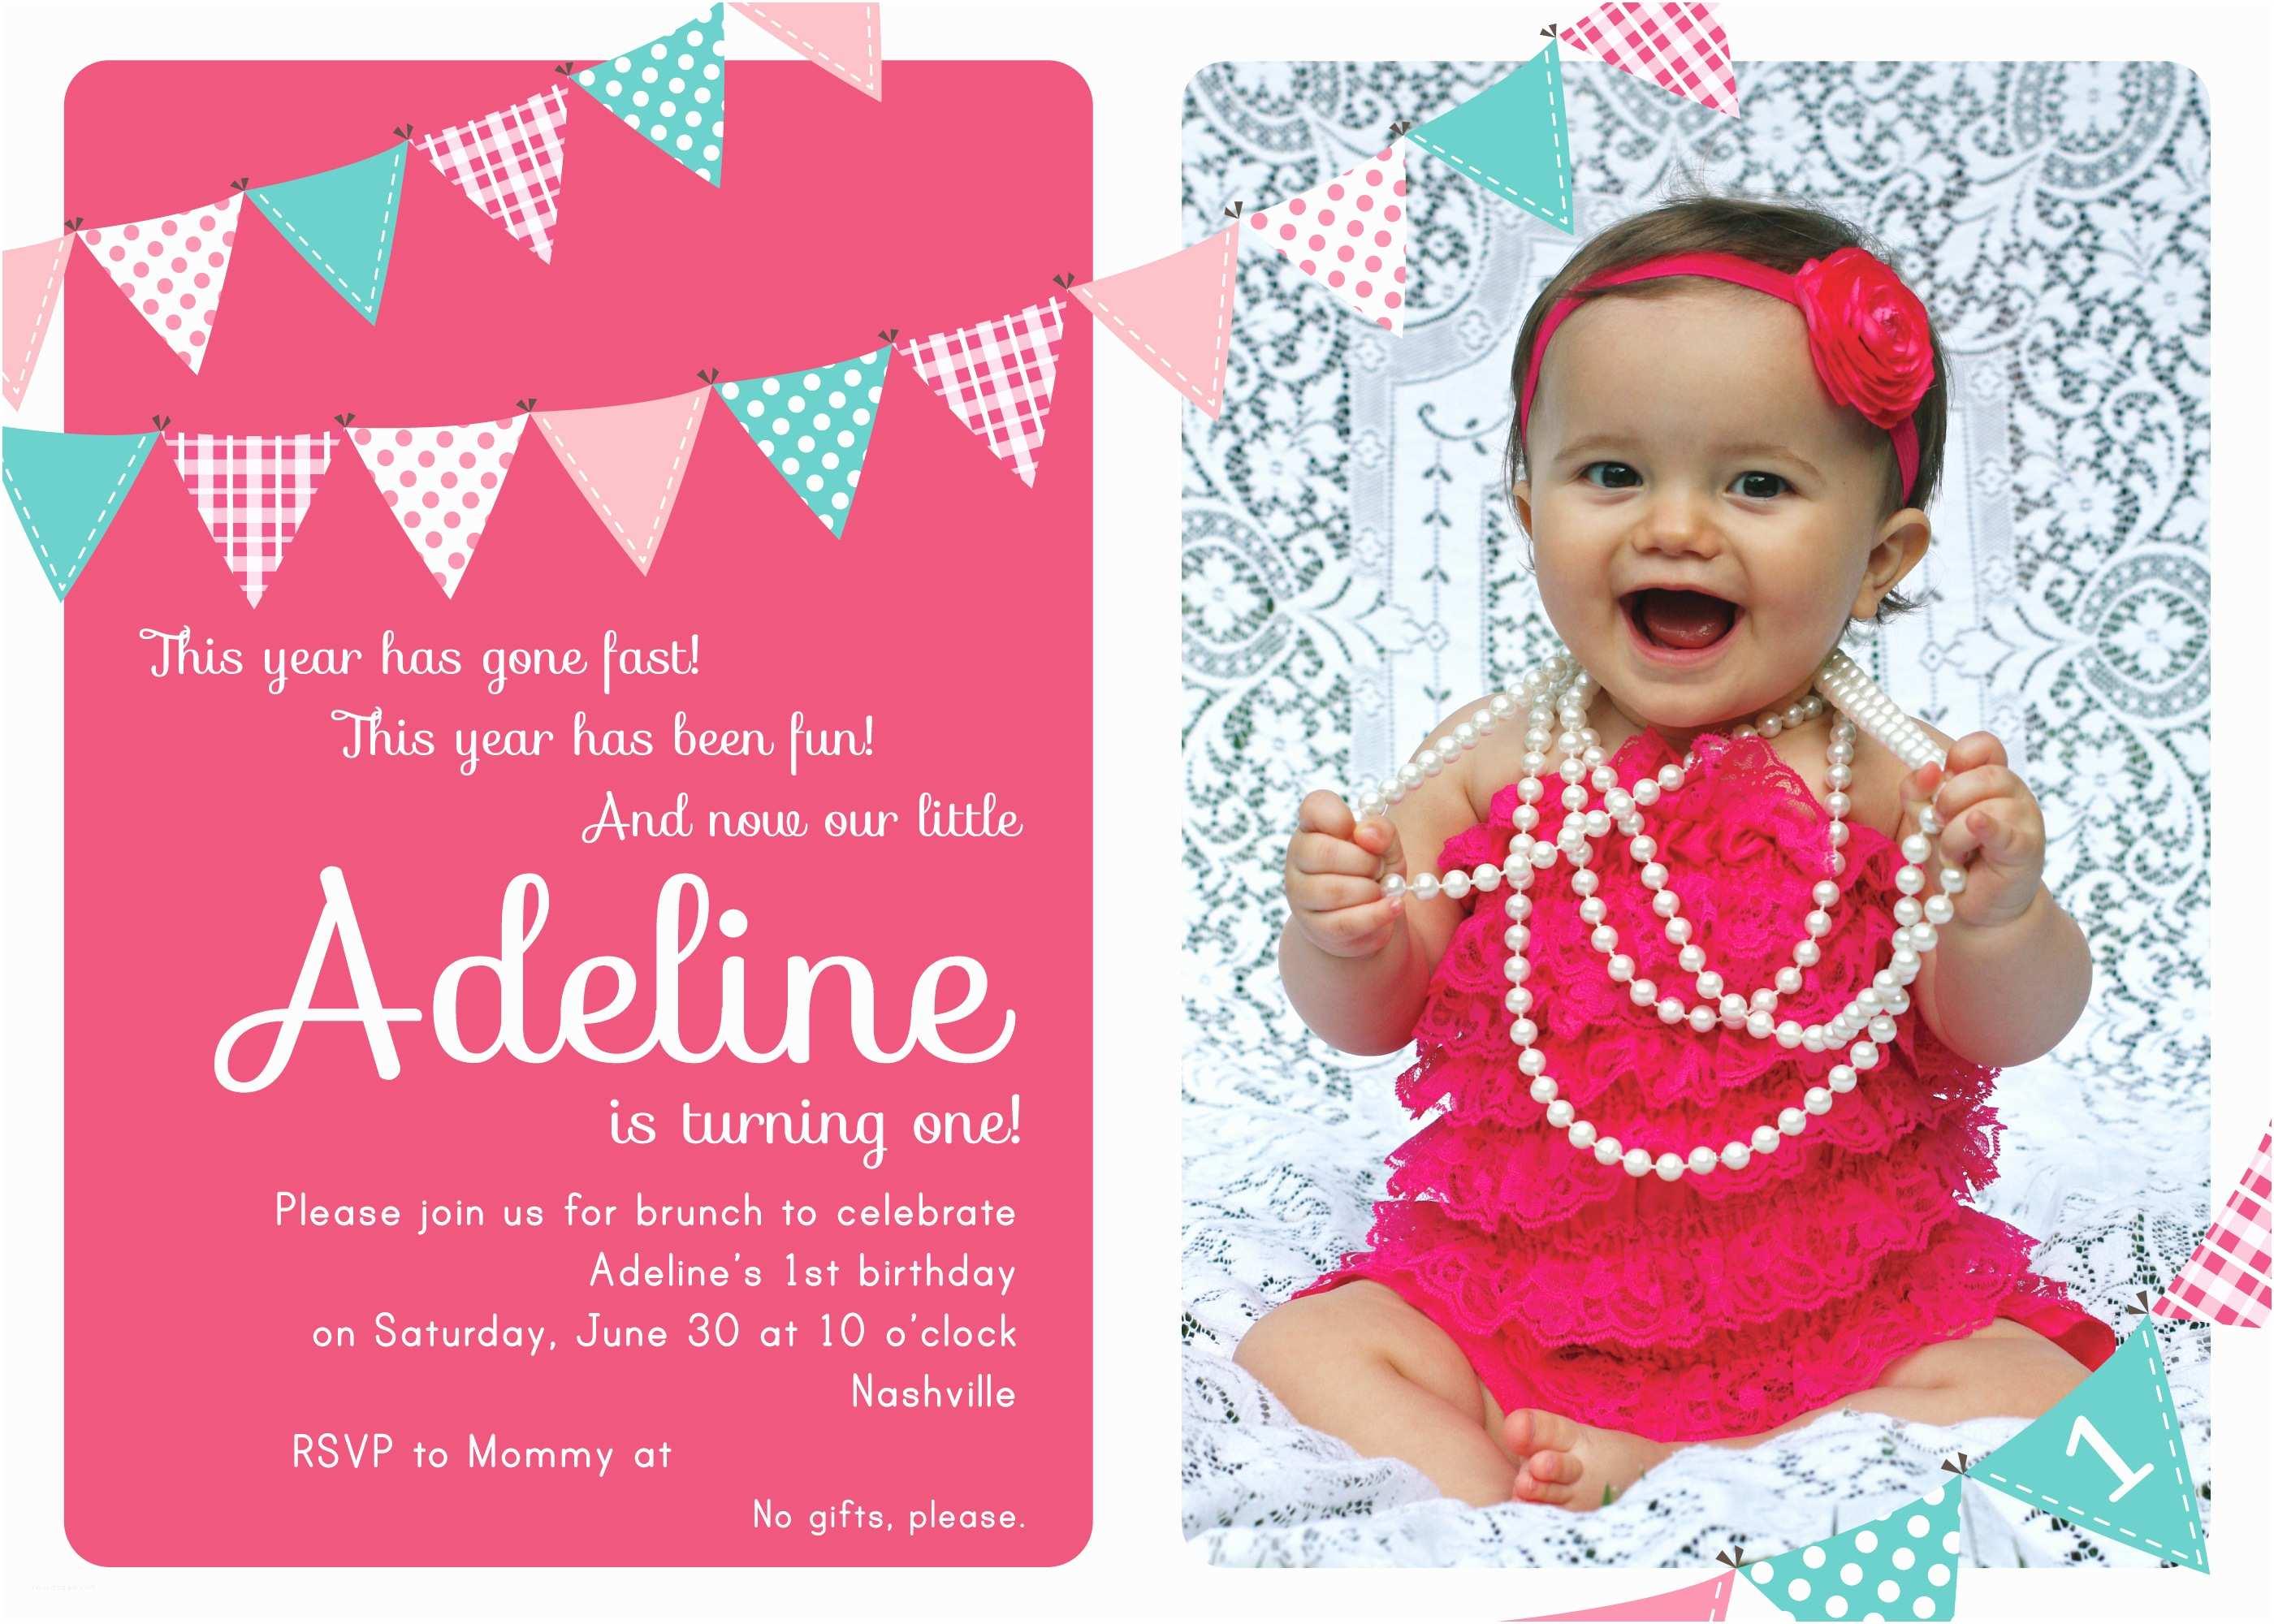 Birthday Invitation Ideas Baby Girl's 1st Birthday Invitation Cards Ideas